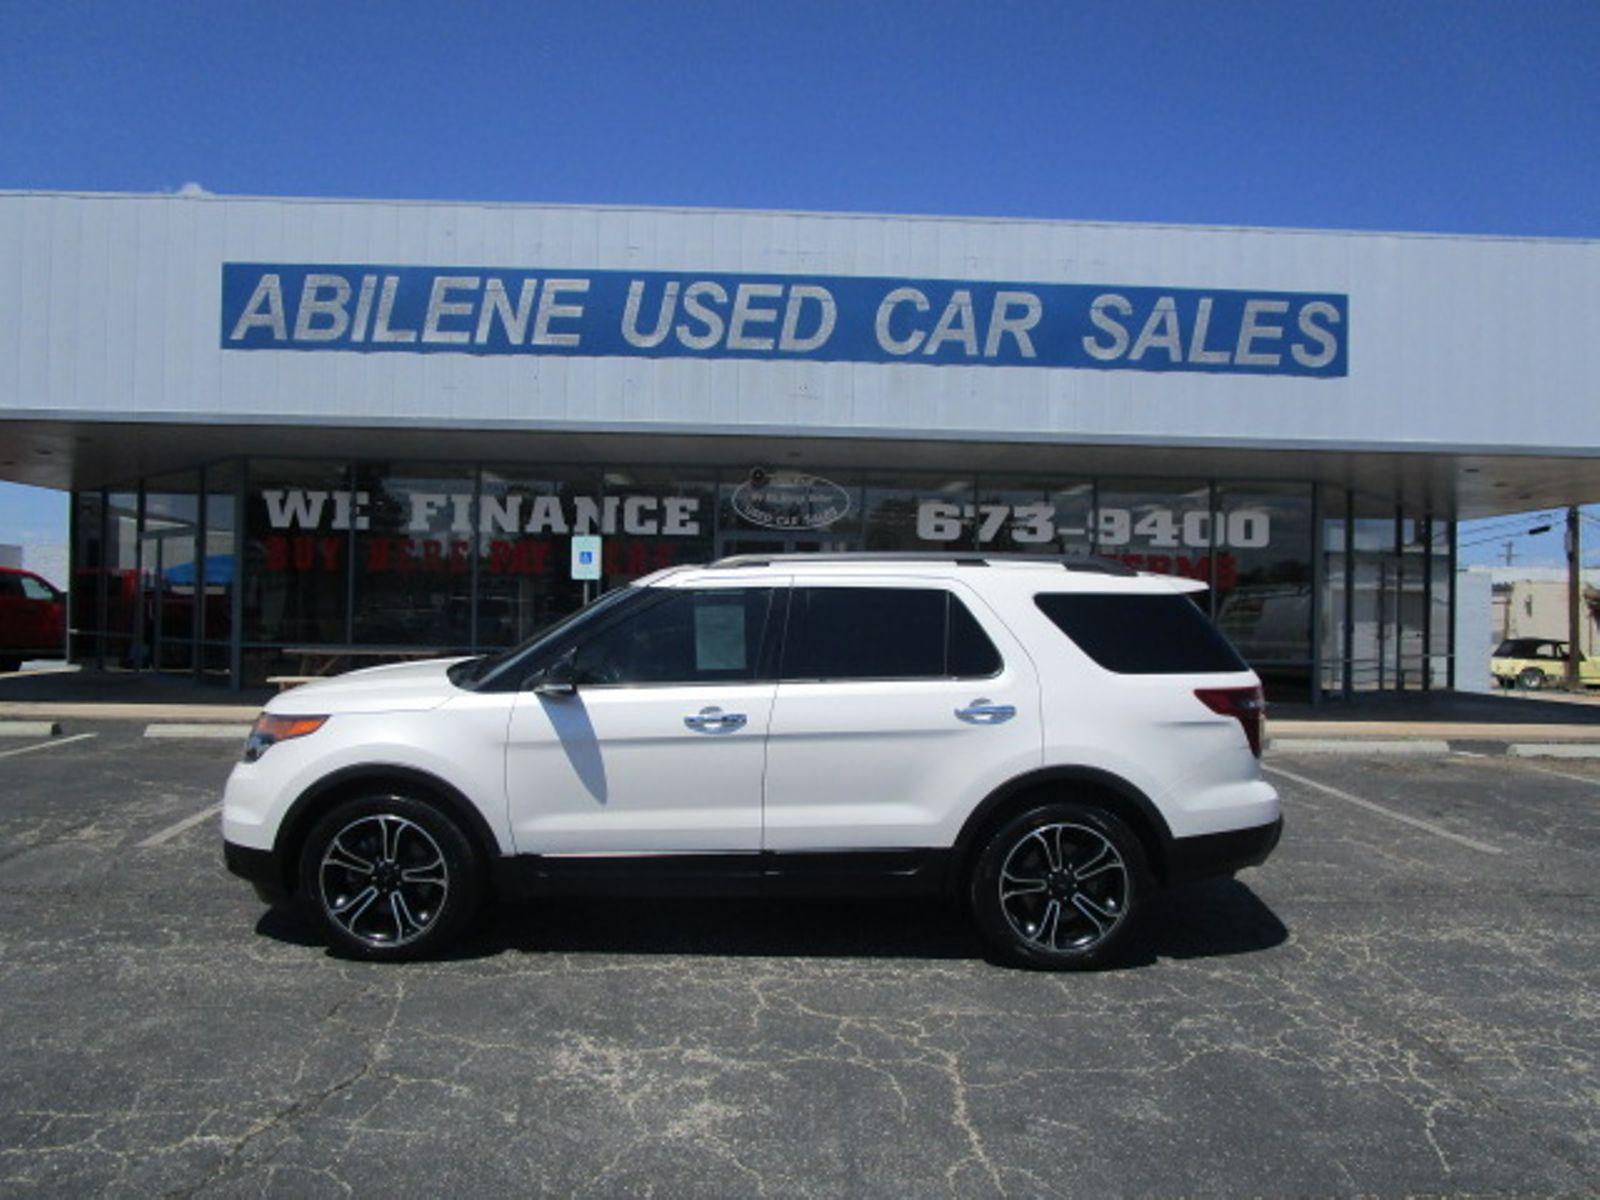 abilene used car sales abilene tx  2014 Ford Explorer Sport Abilene TX Abilene Used Car Sales